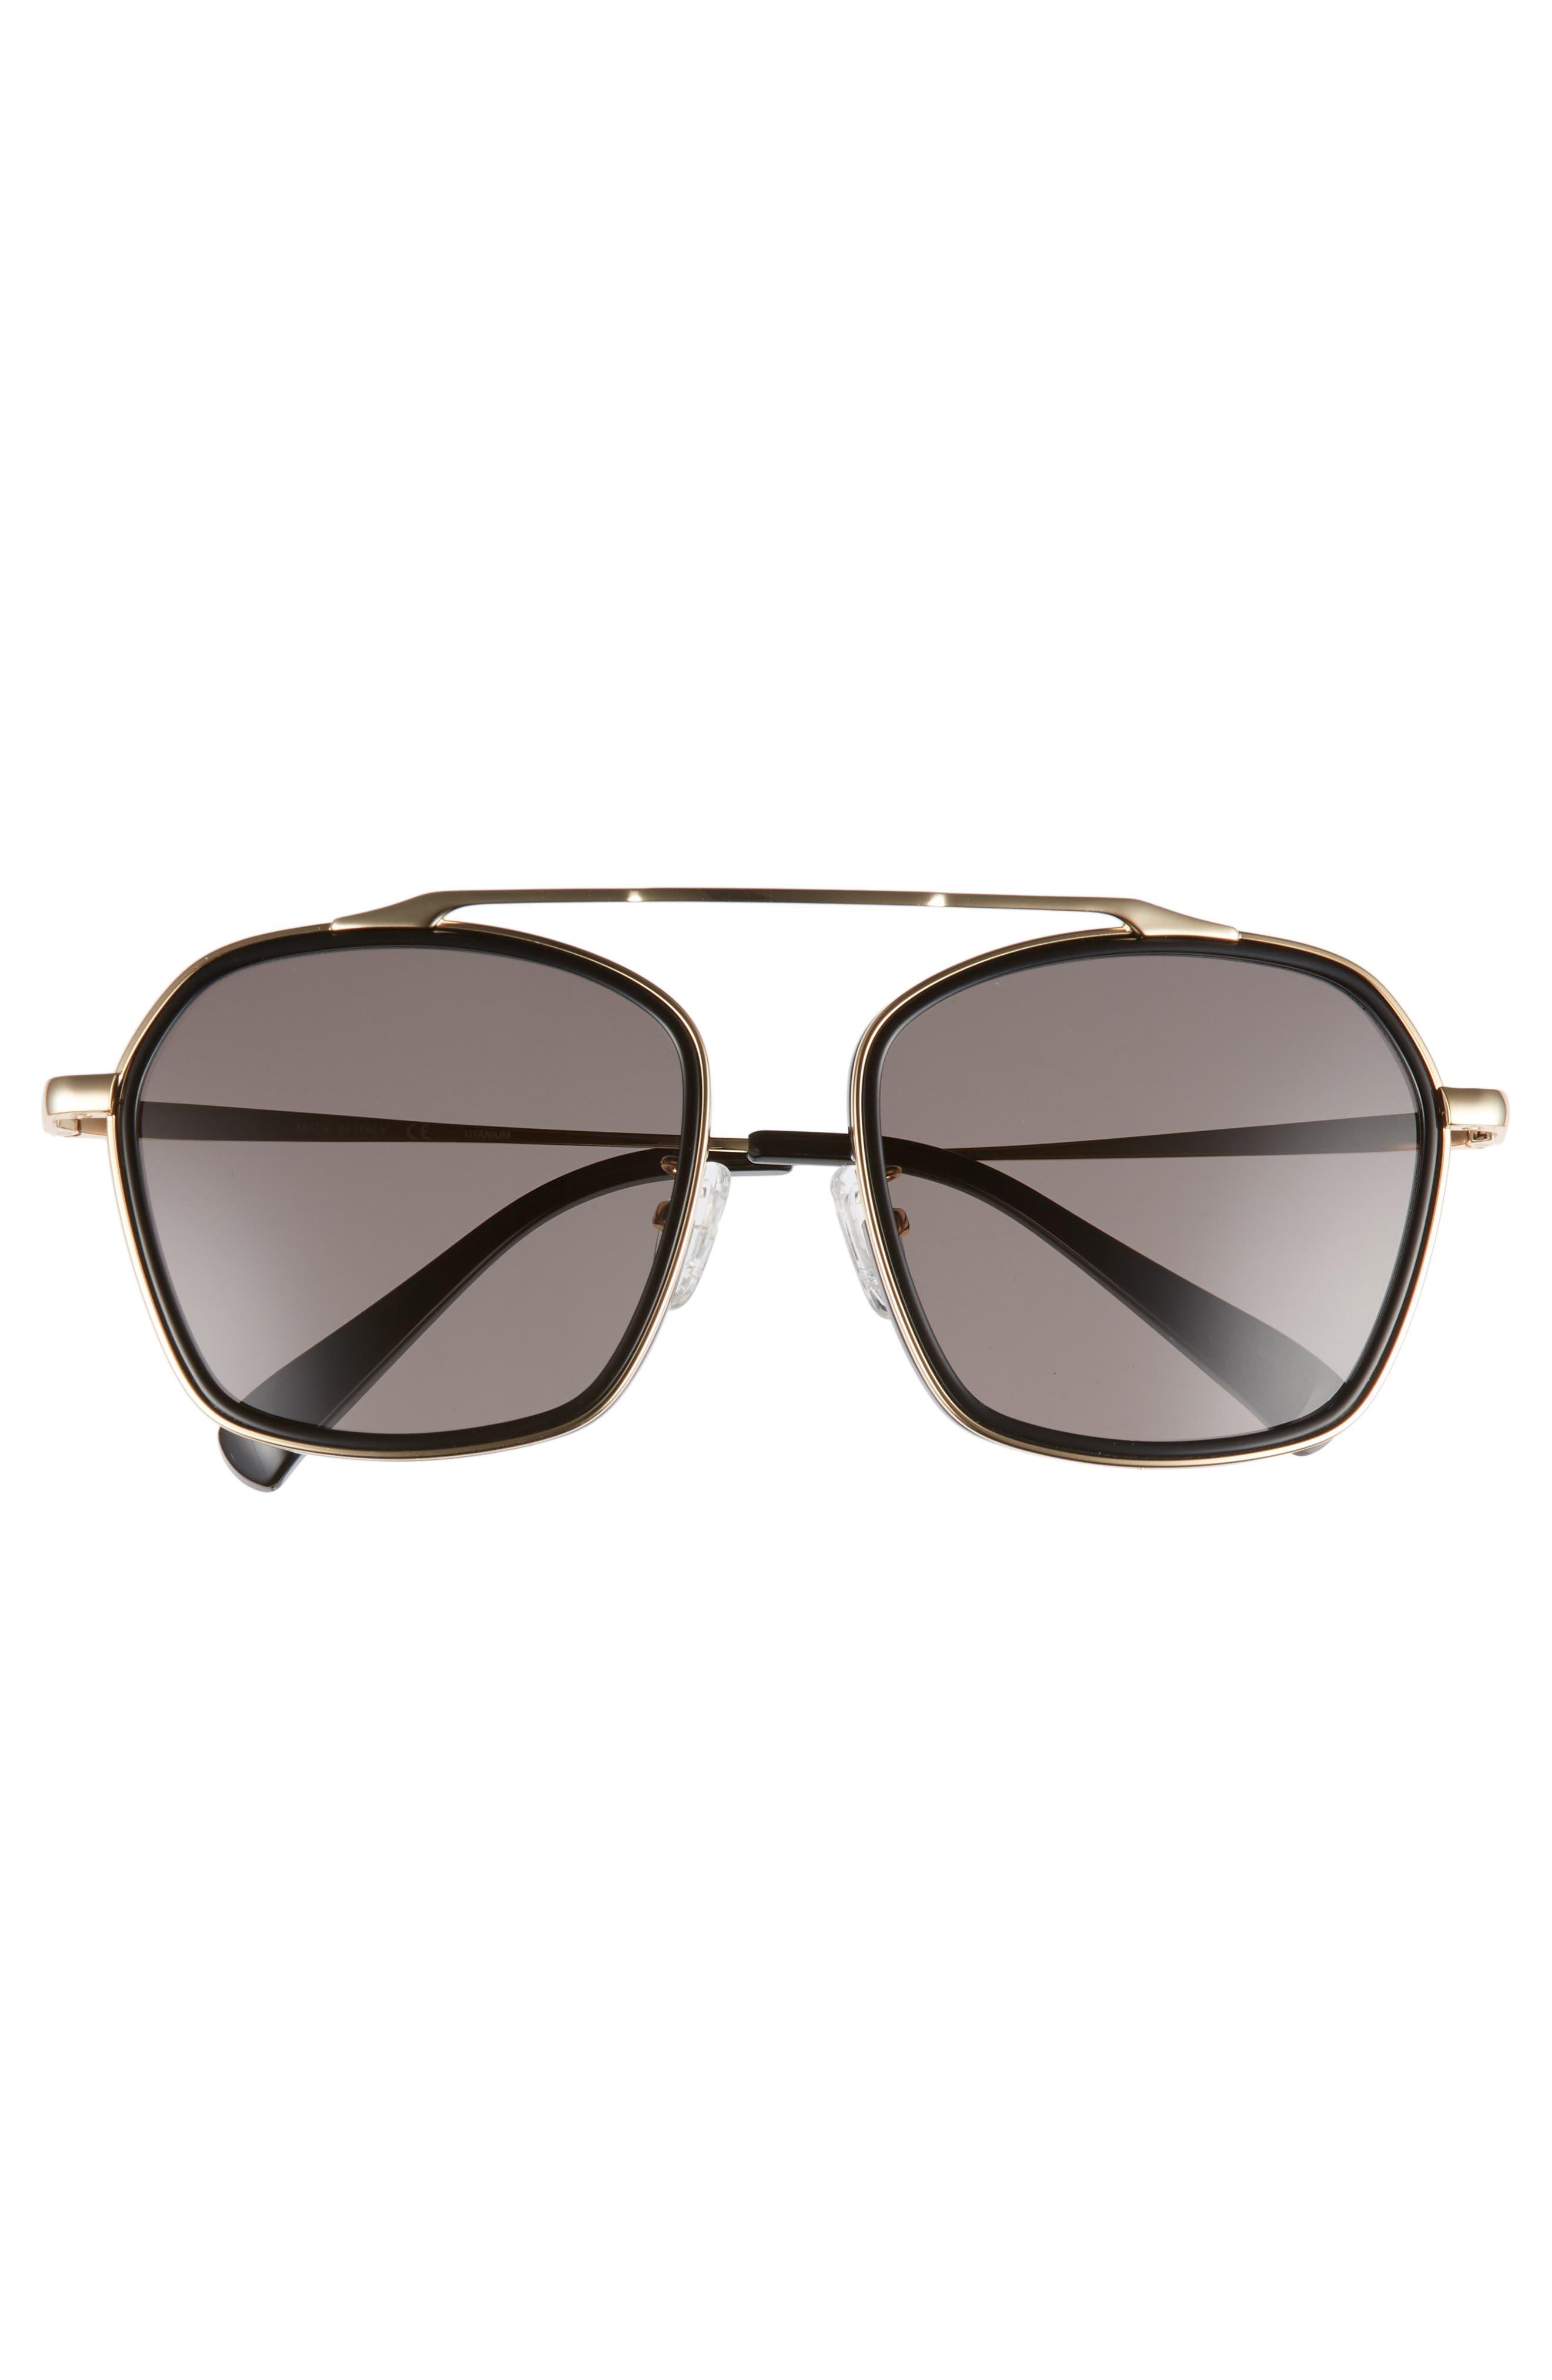 BLANC & ECLARE Vancouver 58mm Polarized Aviator Sunglasses,                             Alternate thumbnail 3, color,                             BLACK/ GOLD/ SMOG GREY